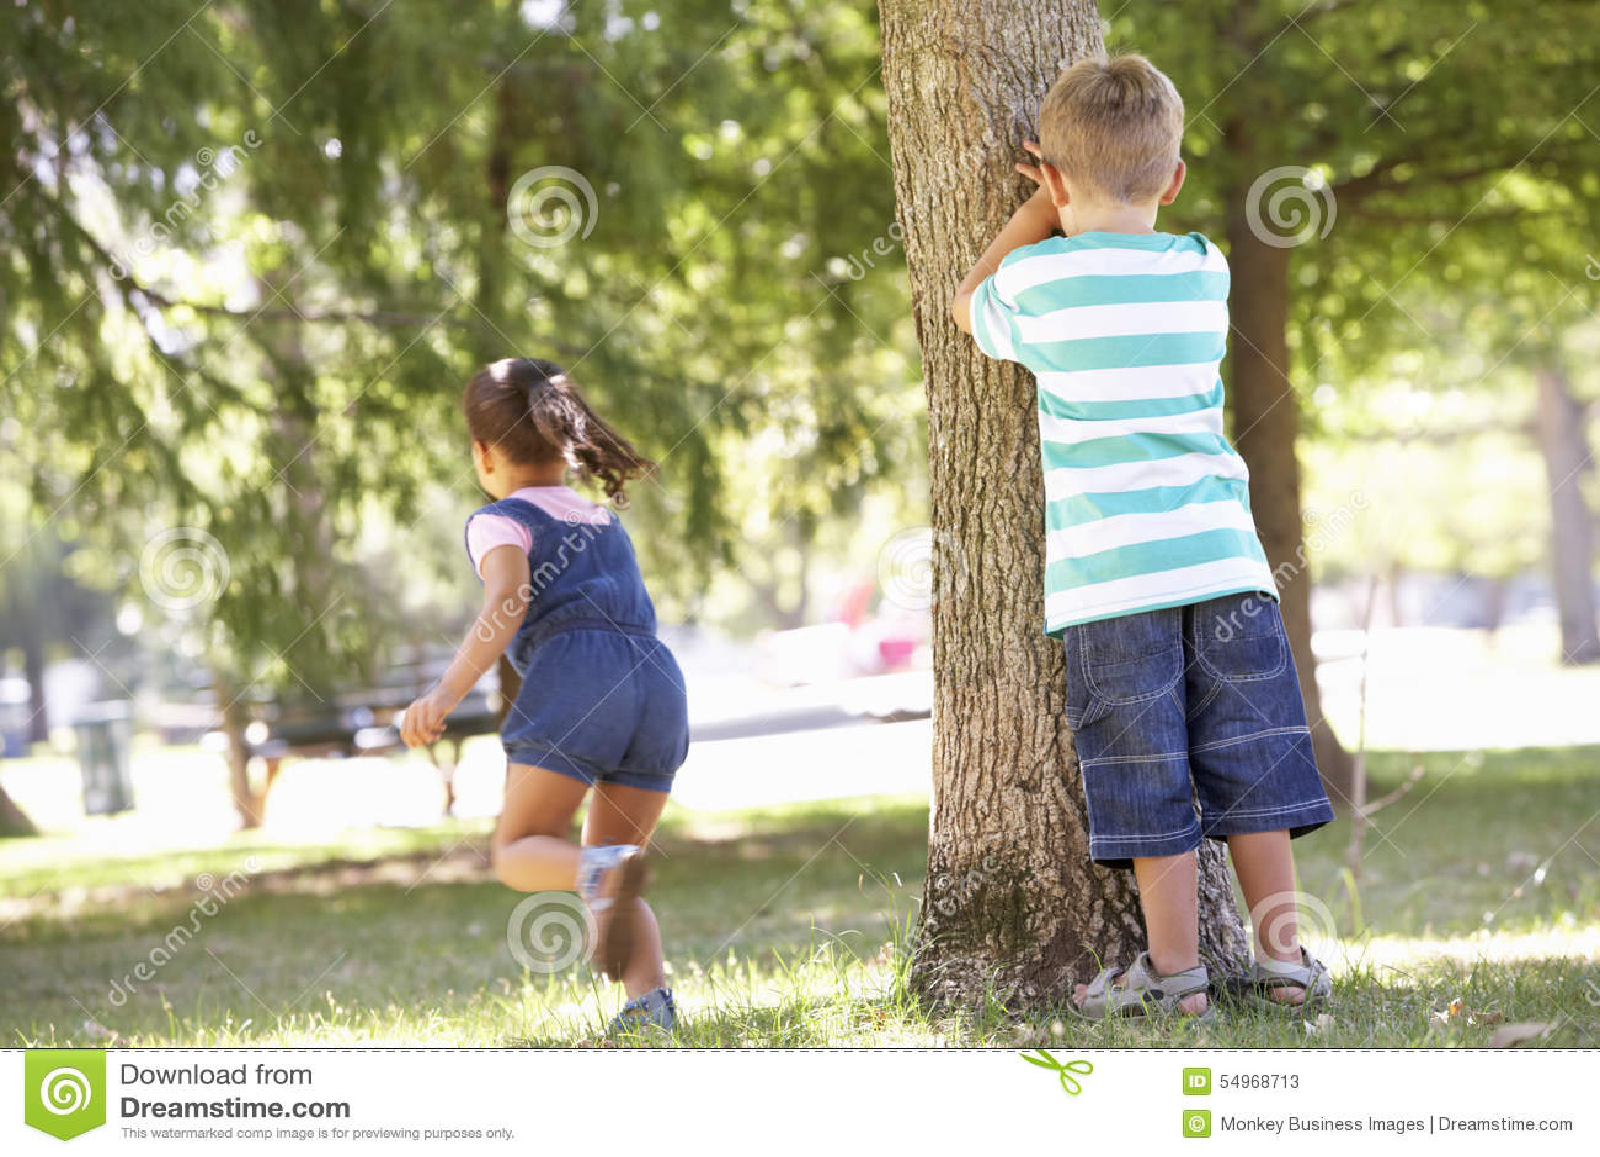 Hide Seek Kids: Two Children Playing Hide And Seek In Park Stock Photo